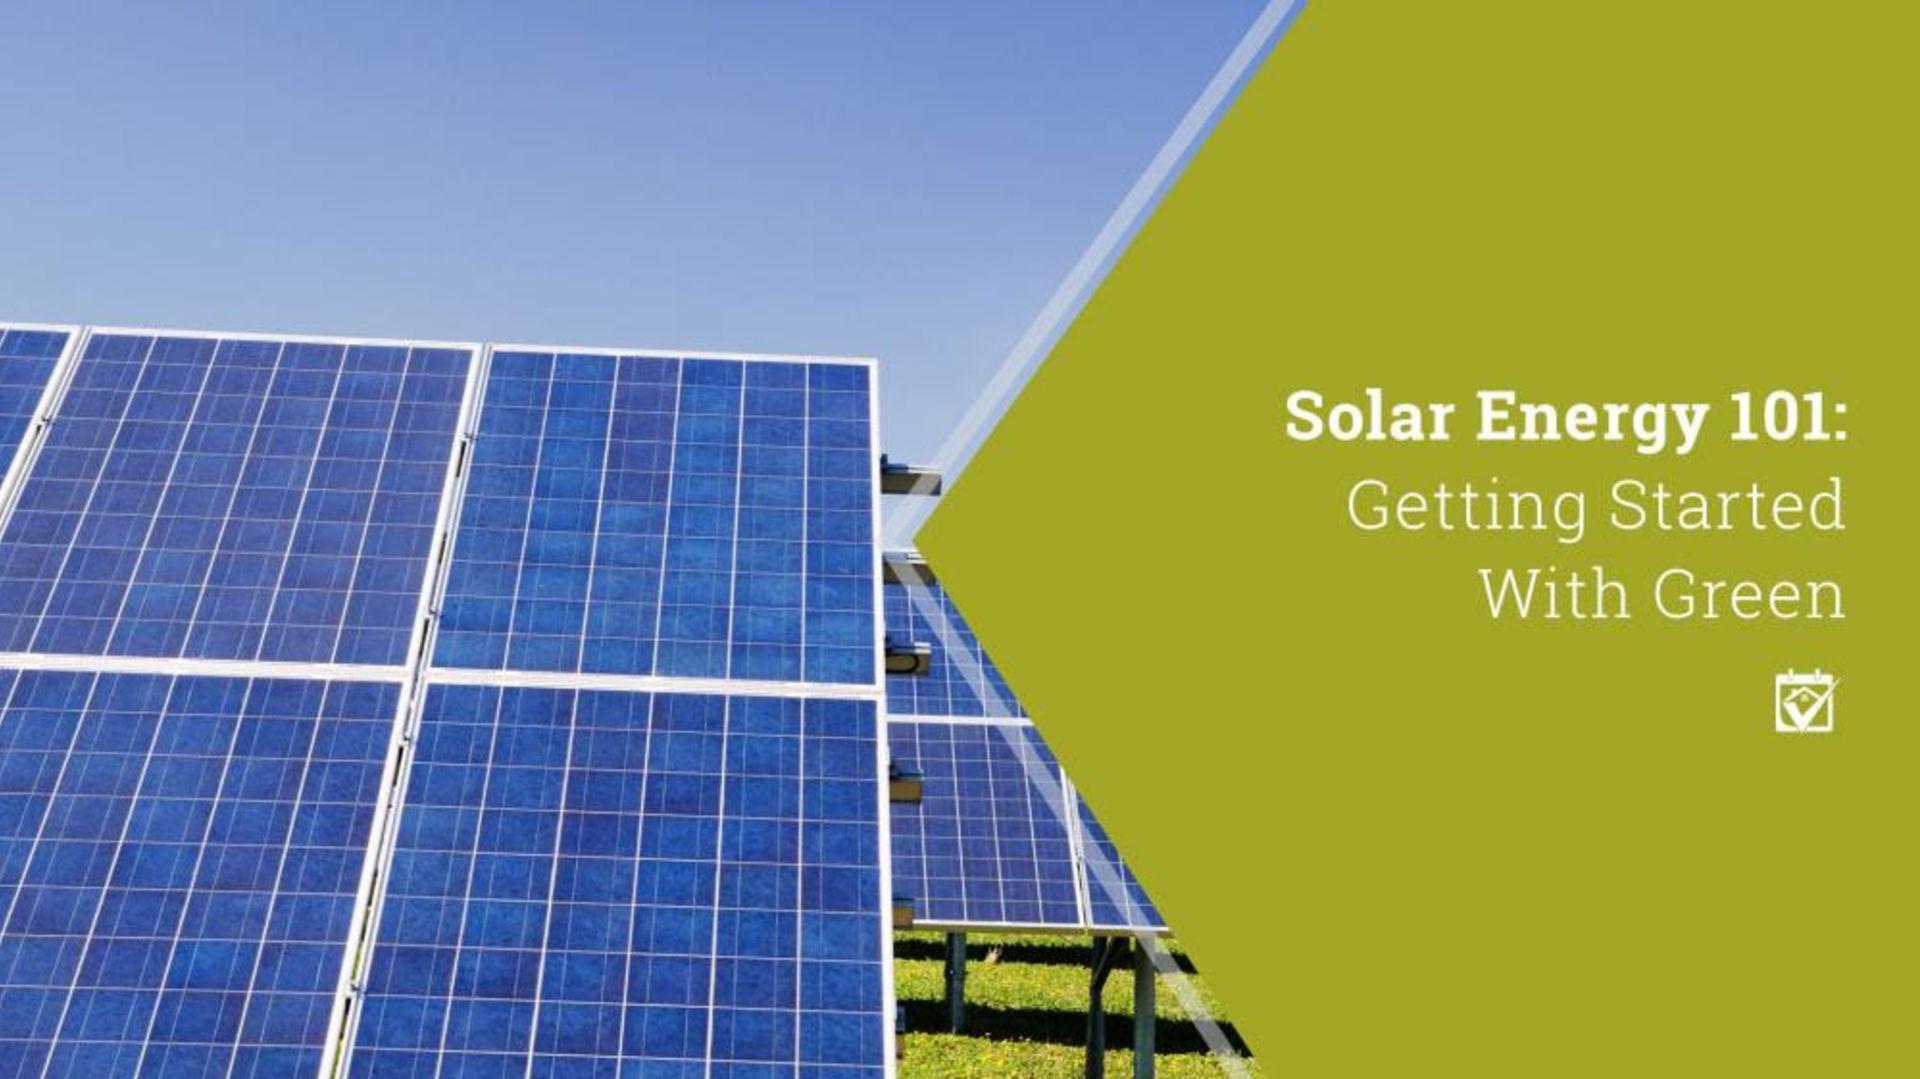 Solar Energy 101